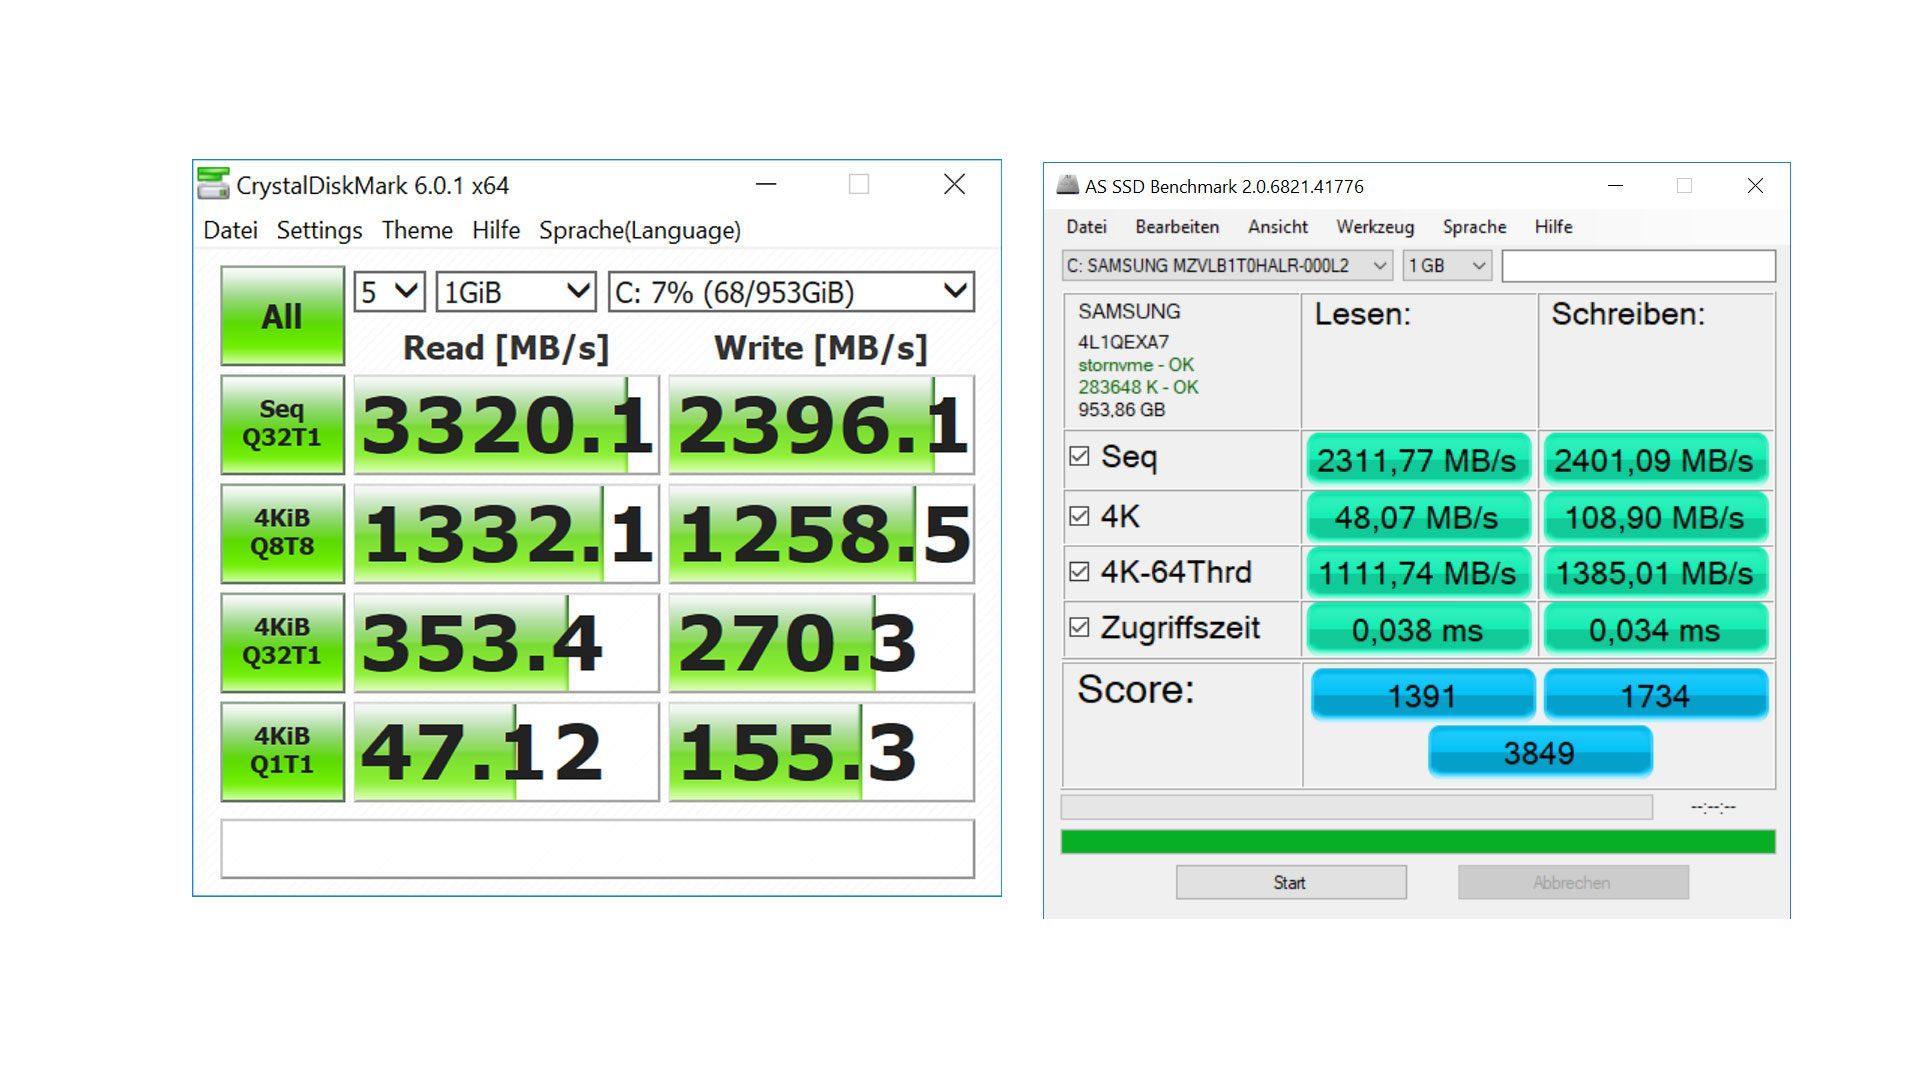 Lenovo YOGA S730-13IWL Benchmark_6